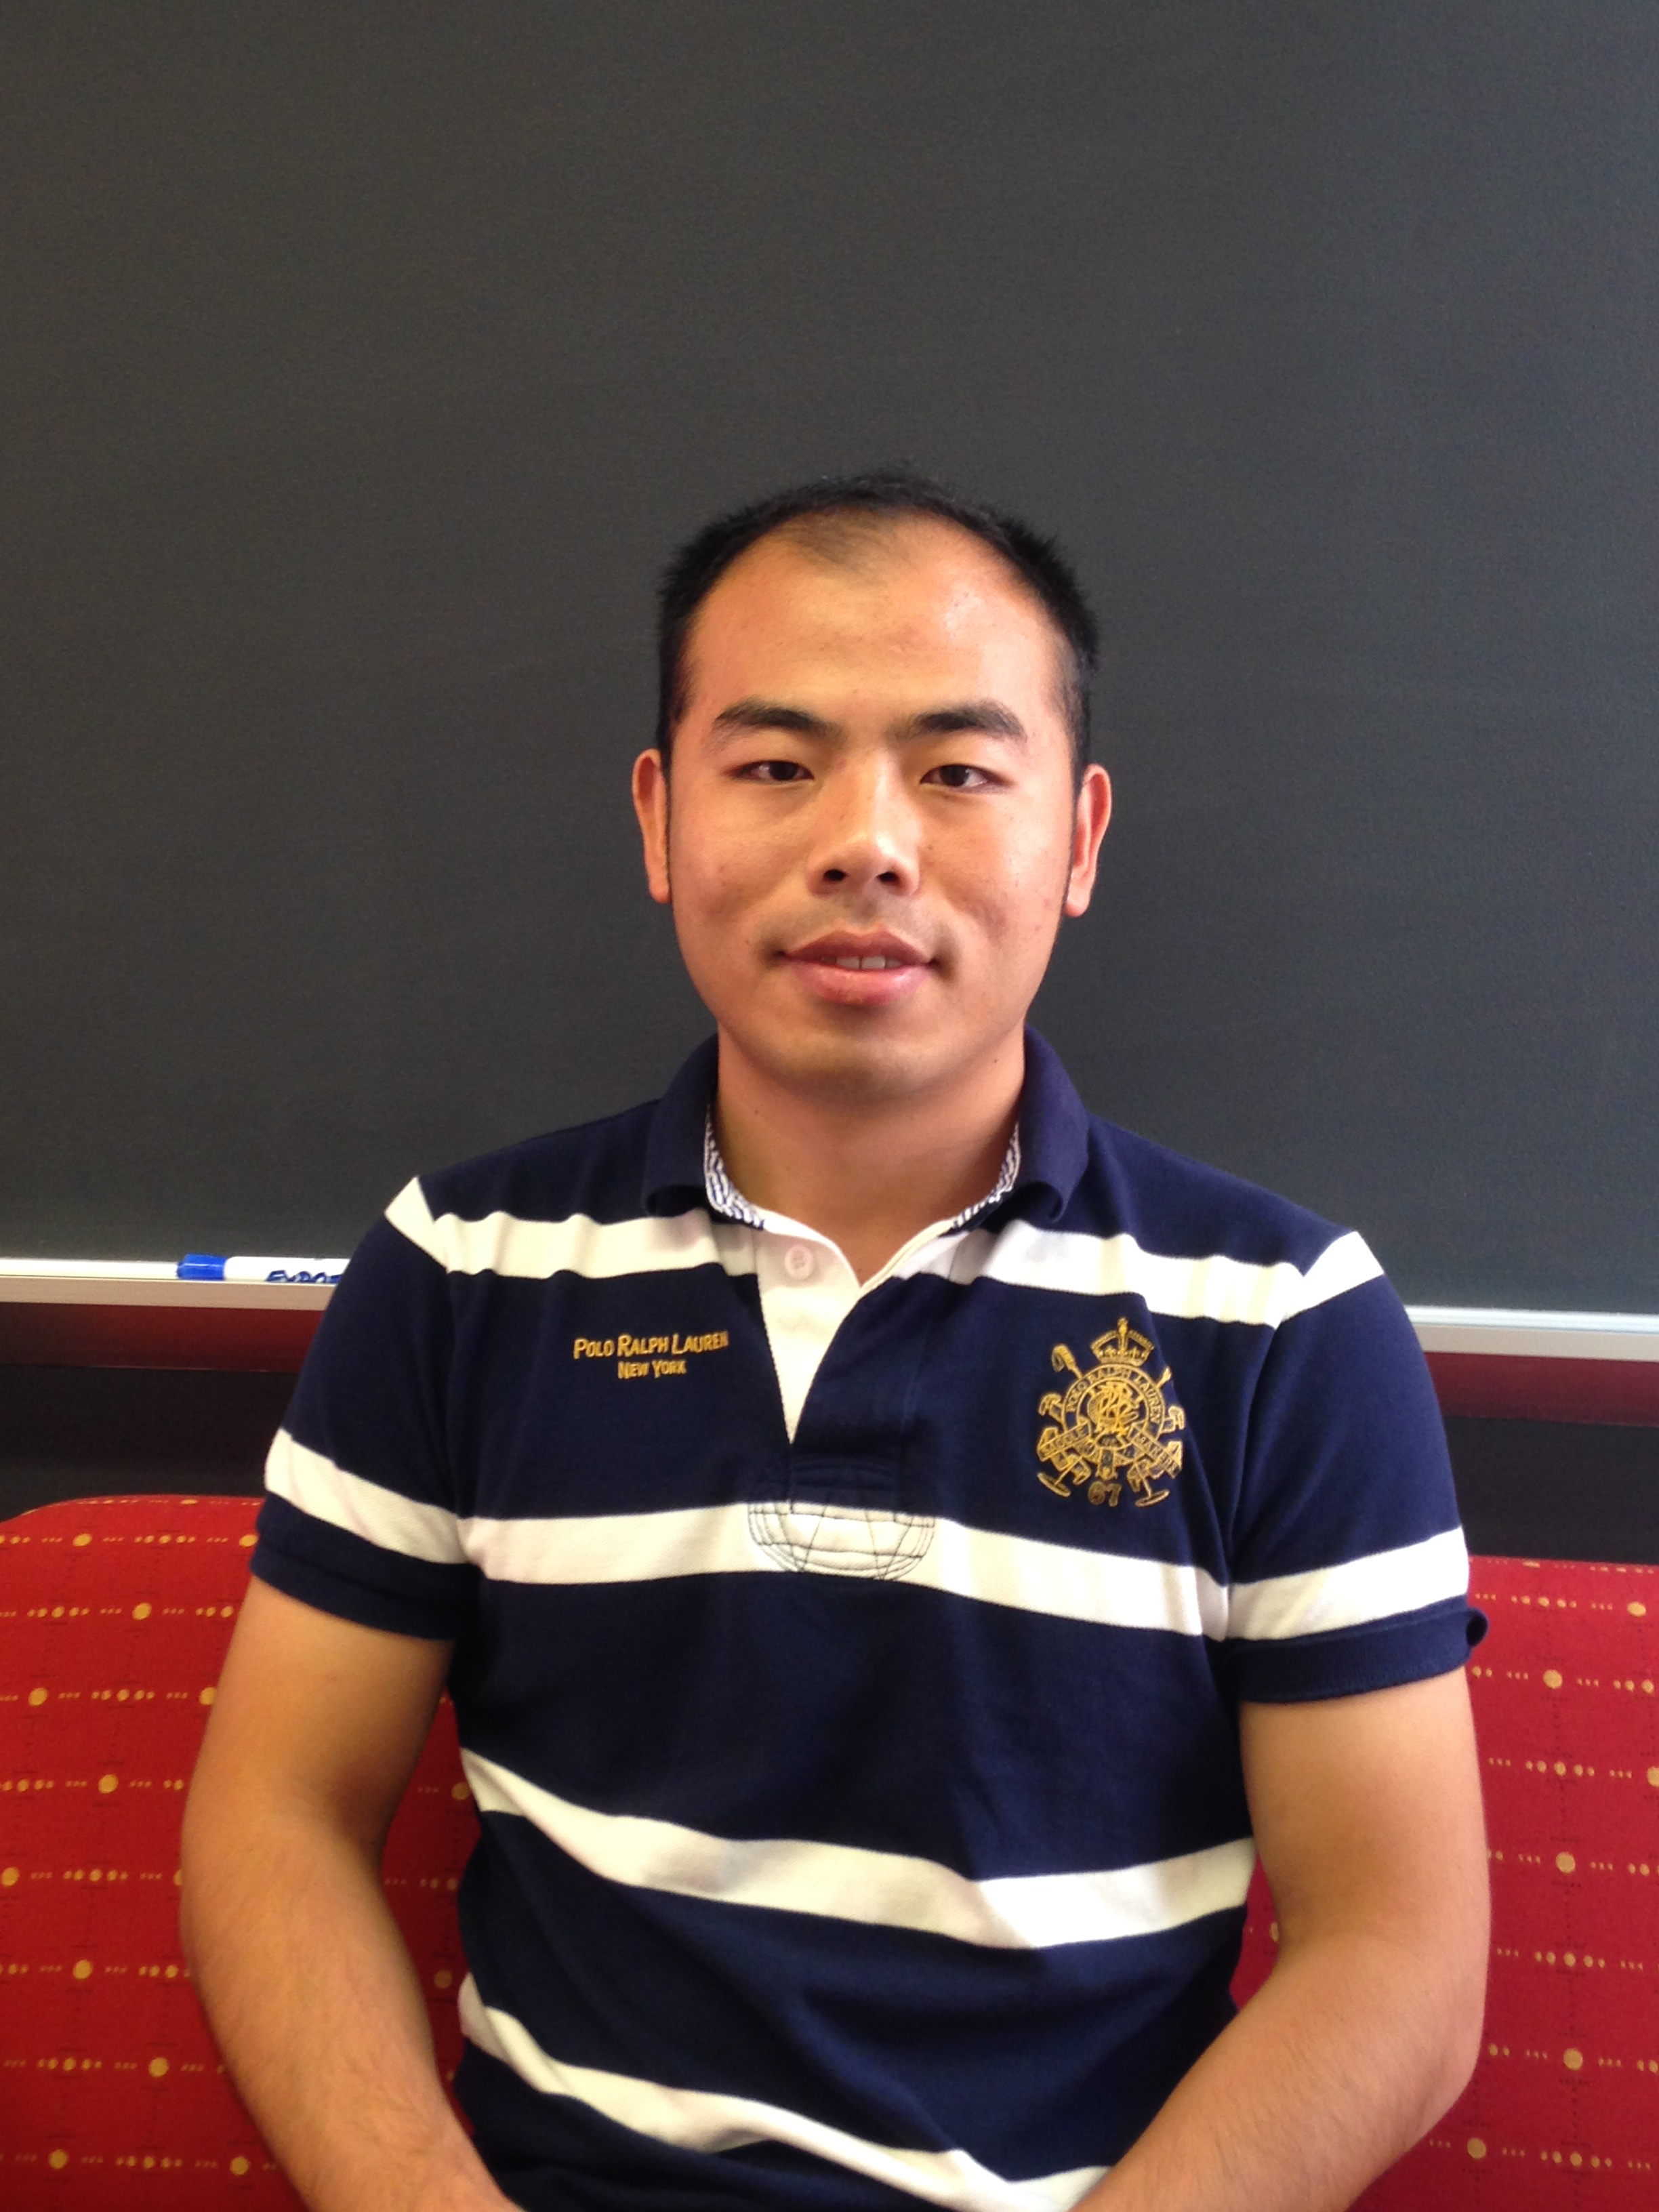 Full size image: UMD graduate student Yanshuo Sun